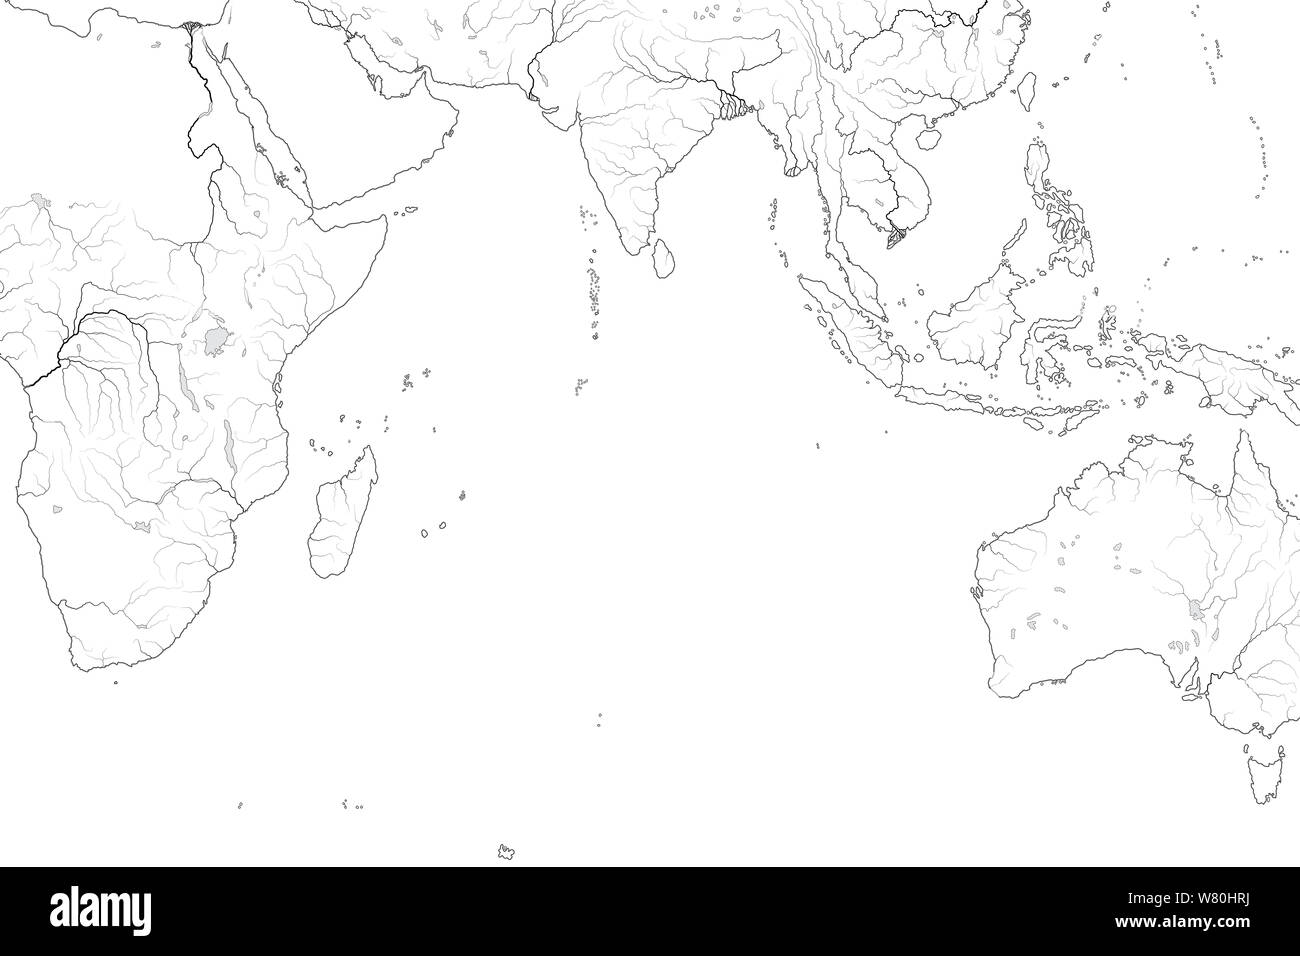 Picture of: World Map Of Indian Ocean Arabian Sea Bengal Bay Sri Lanka The Maldives The Seychelles Ceylon India Africa Australia Indonesia Madagascar Stock Photo Alamy